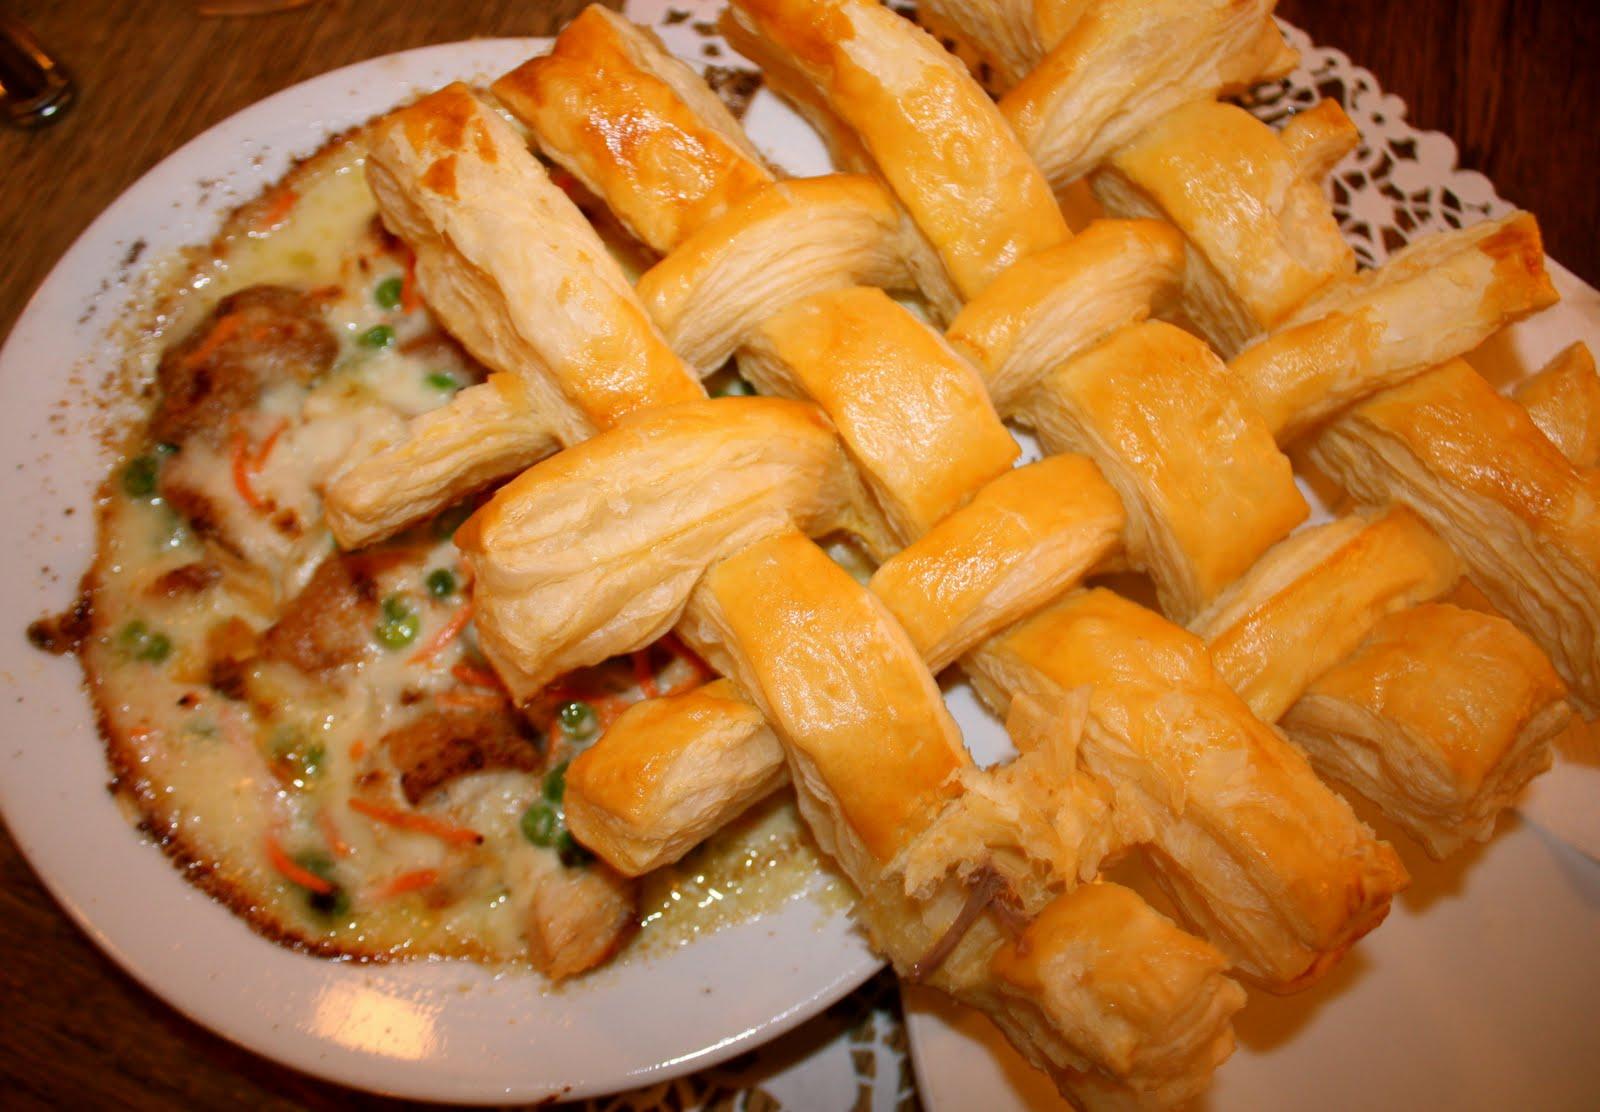 Penn apptit southern sights southern hospitality southern food forumfinder Choice Image